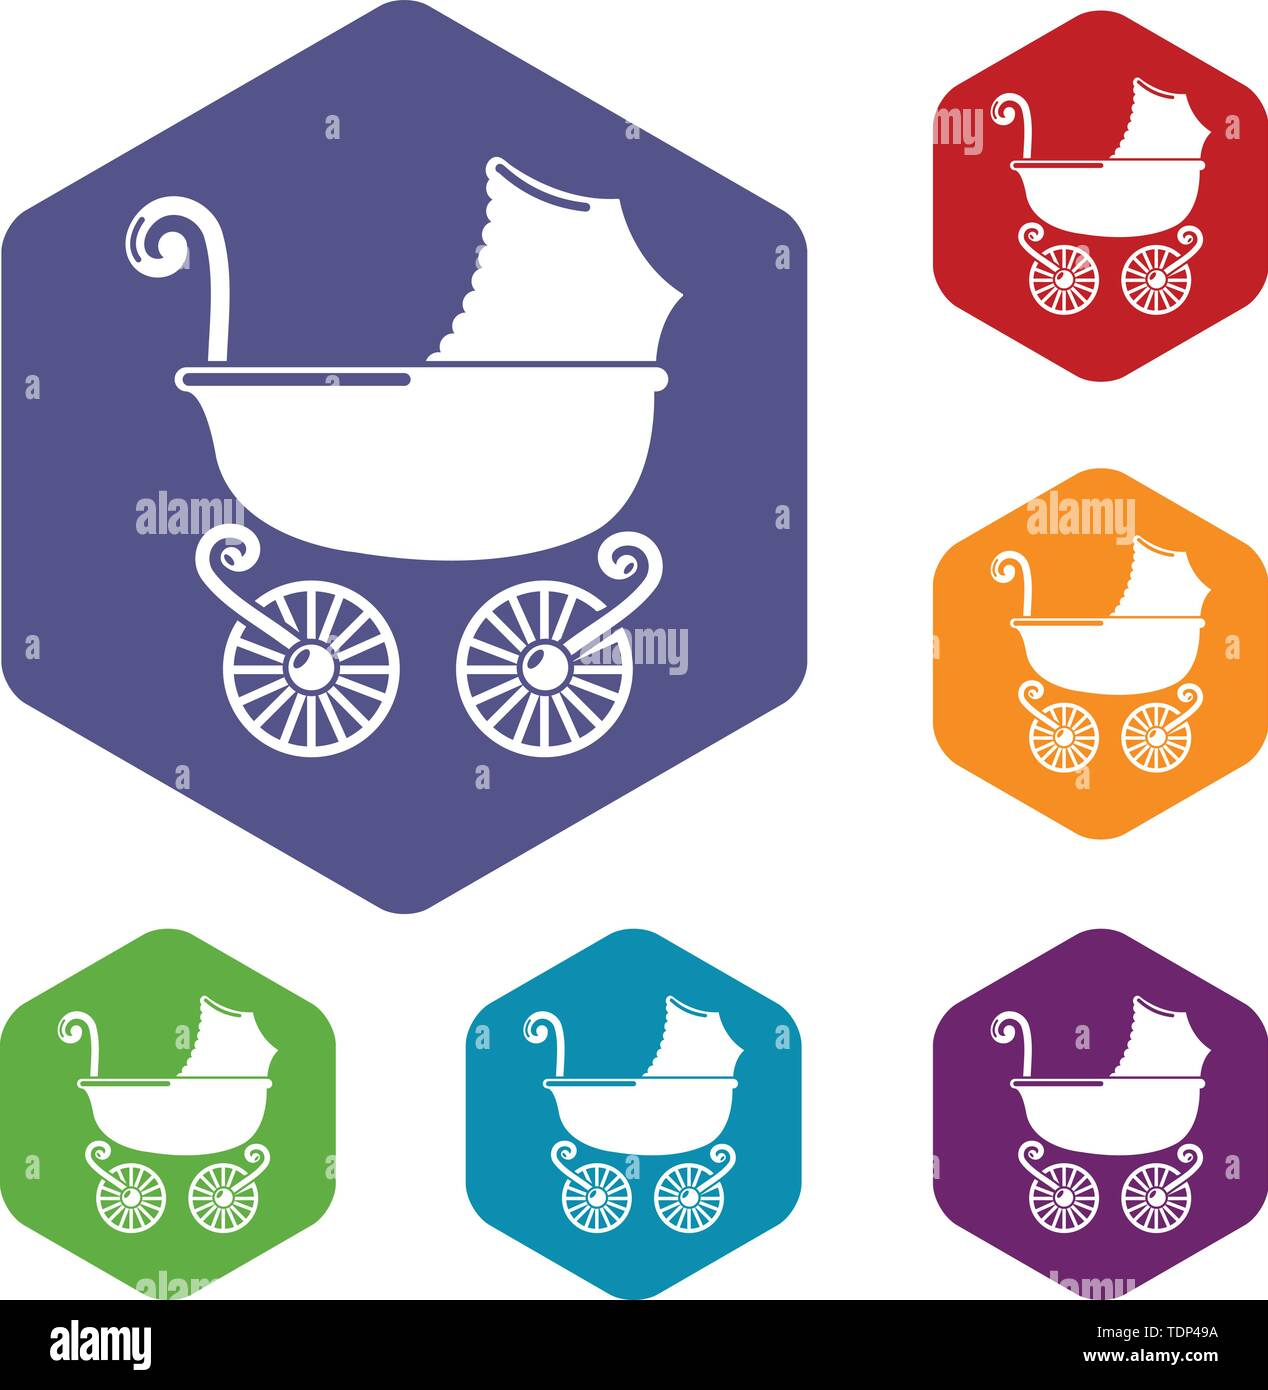 Kinderwagen vintage Symbole Vektor hexaeder Stockbild